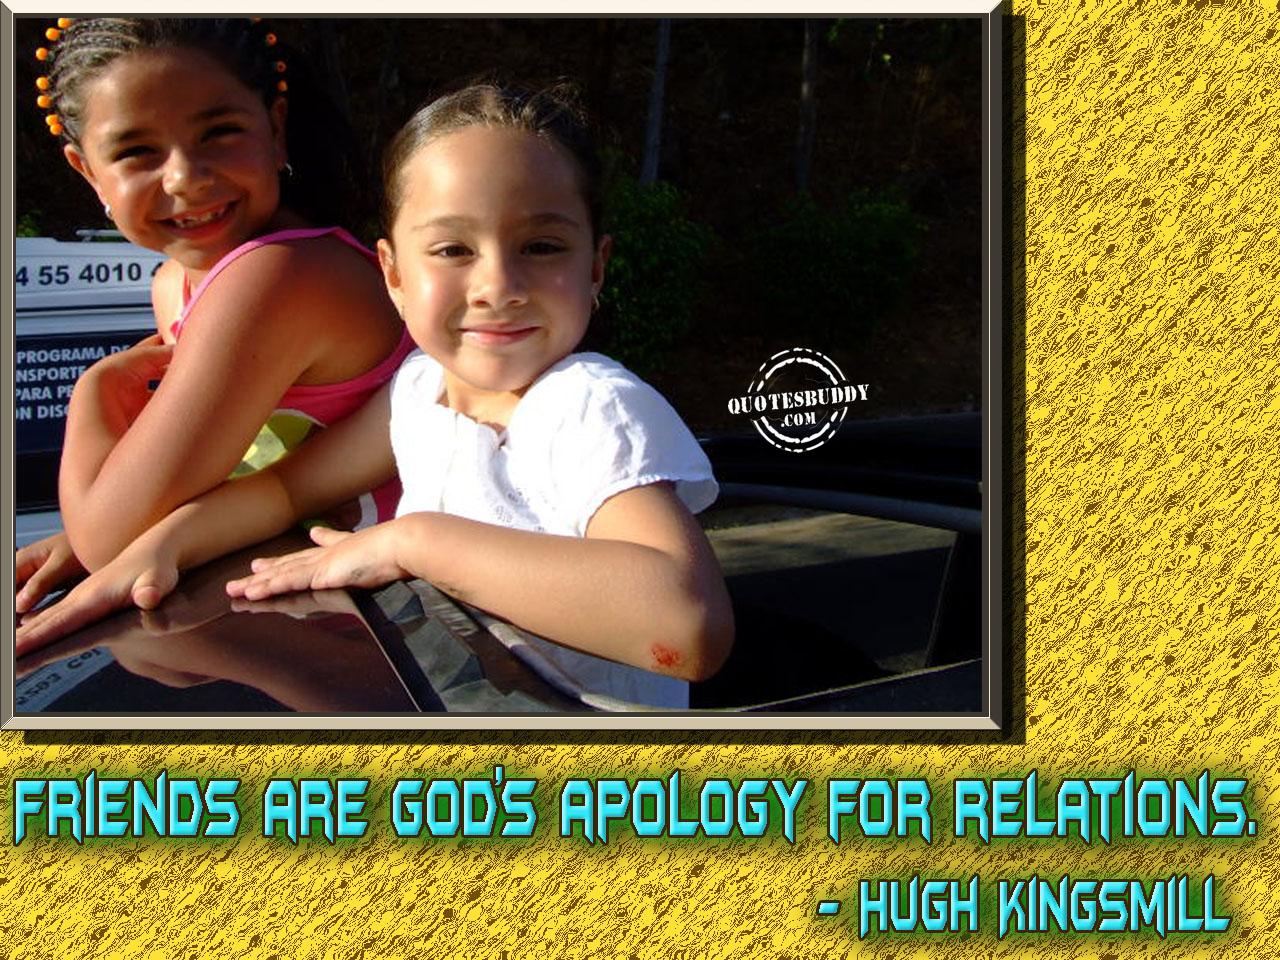 Hugh Kingsmill's quote #1